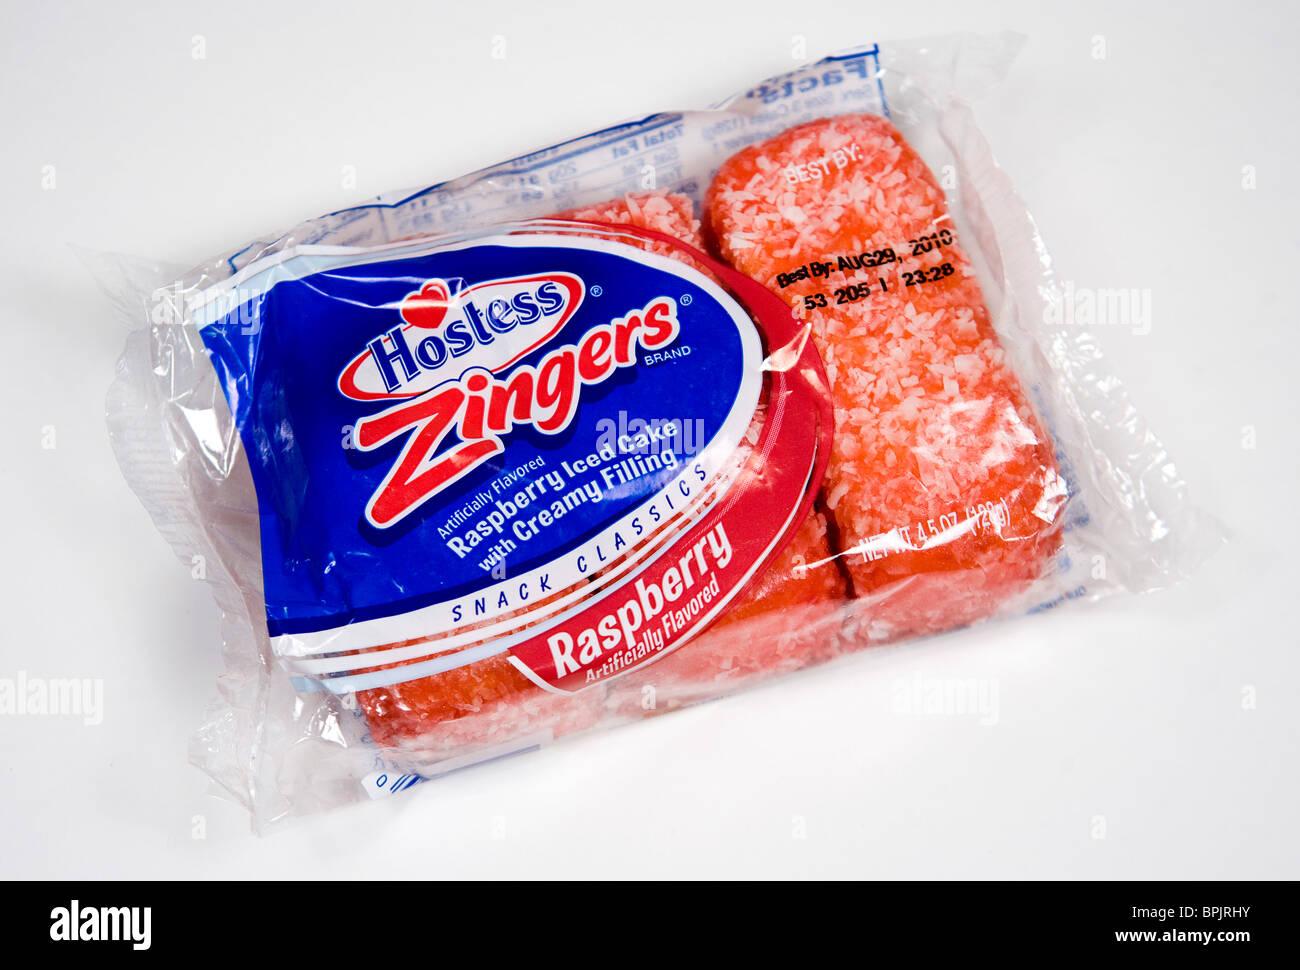 Hostess Raspberry Zingers Stock Photo: 31146471 - Alamy